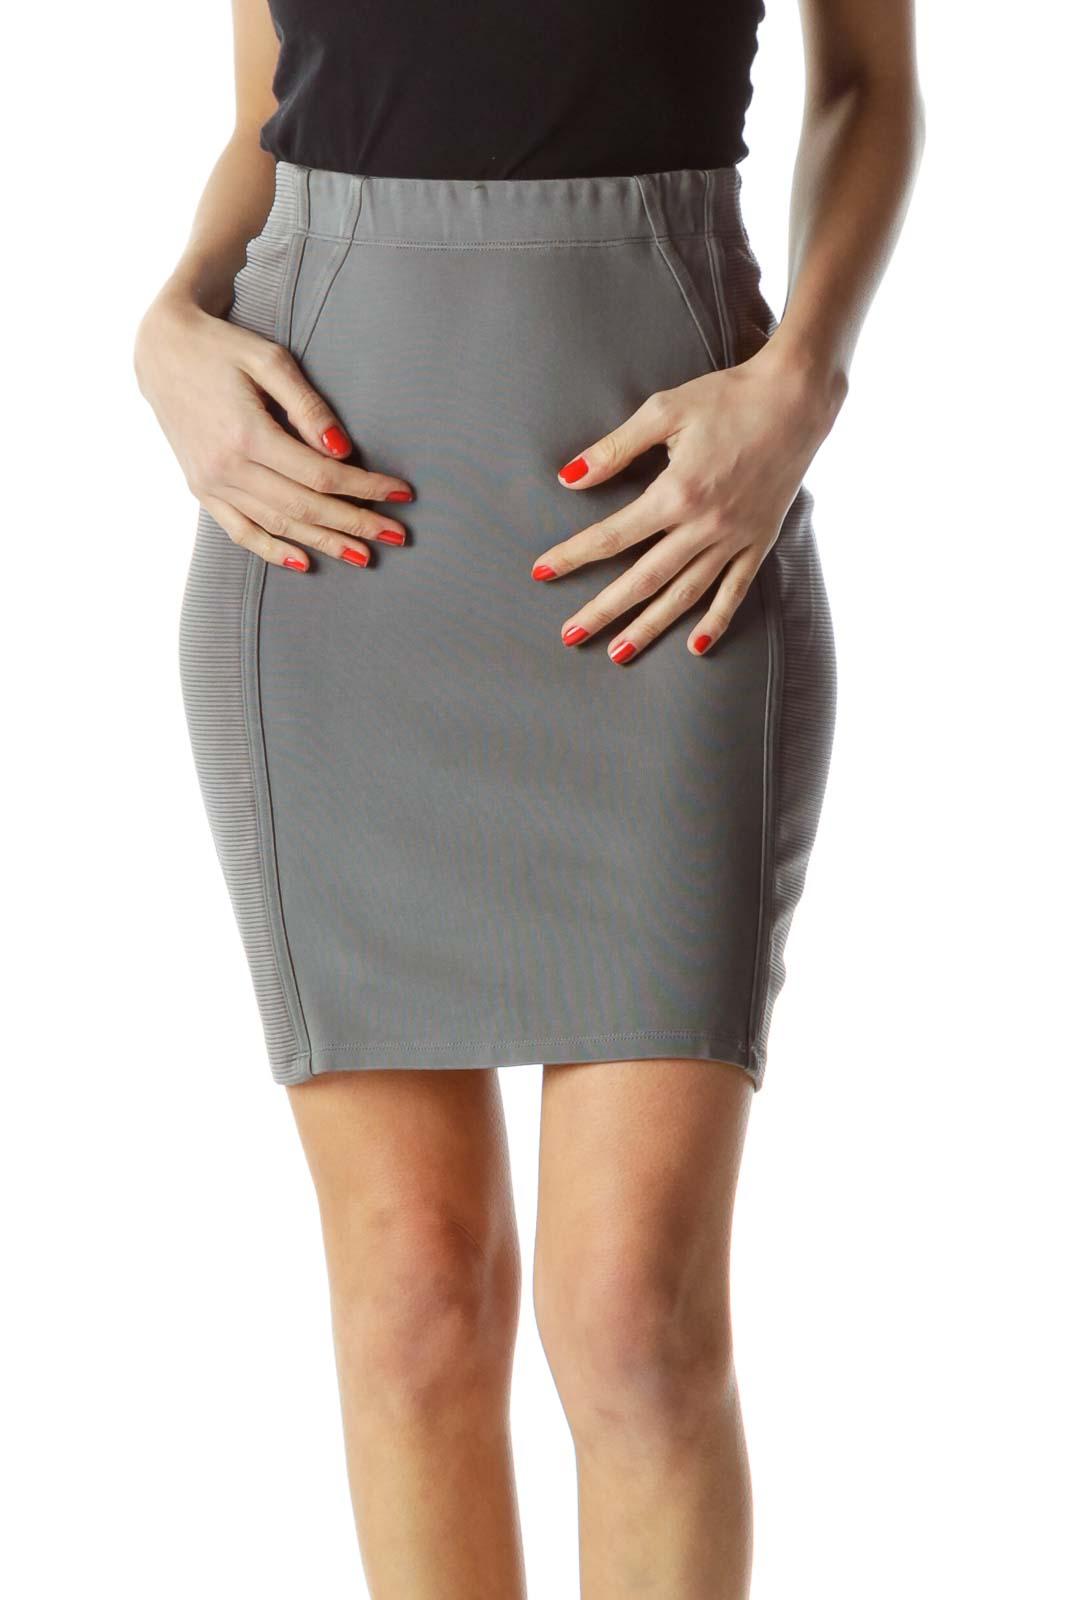 Gray Elastic Textured Pencil Slim-Fit Skirt